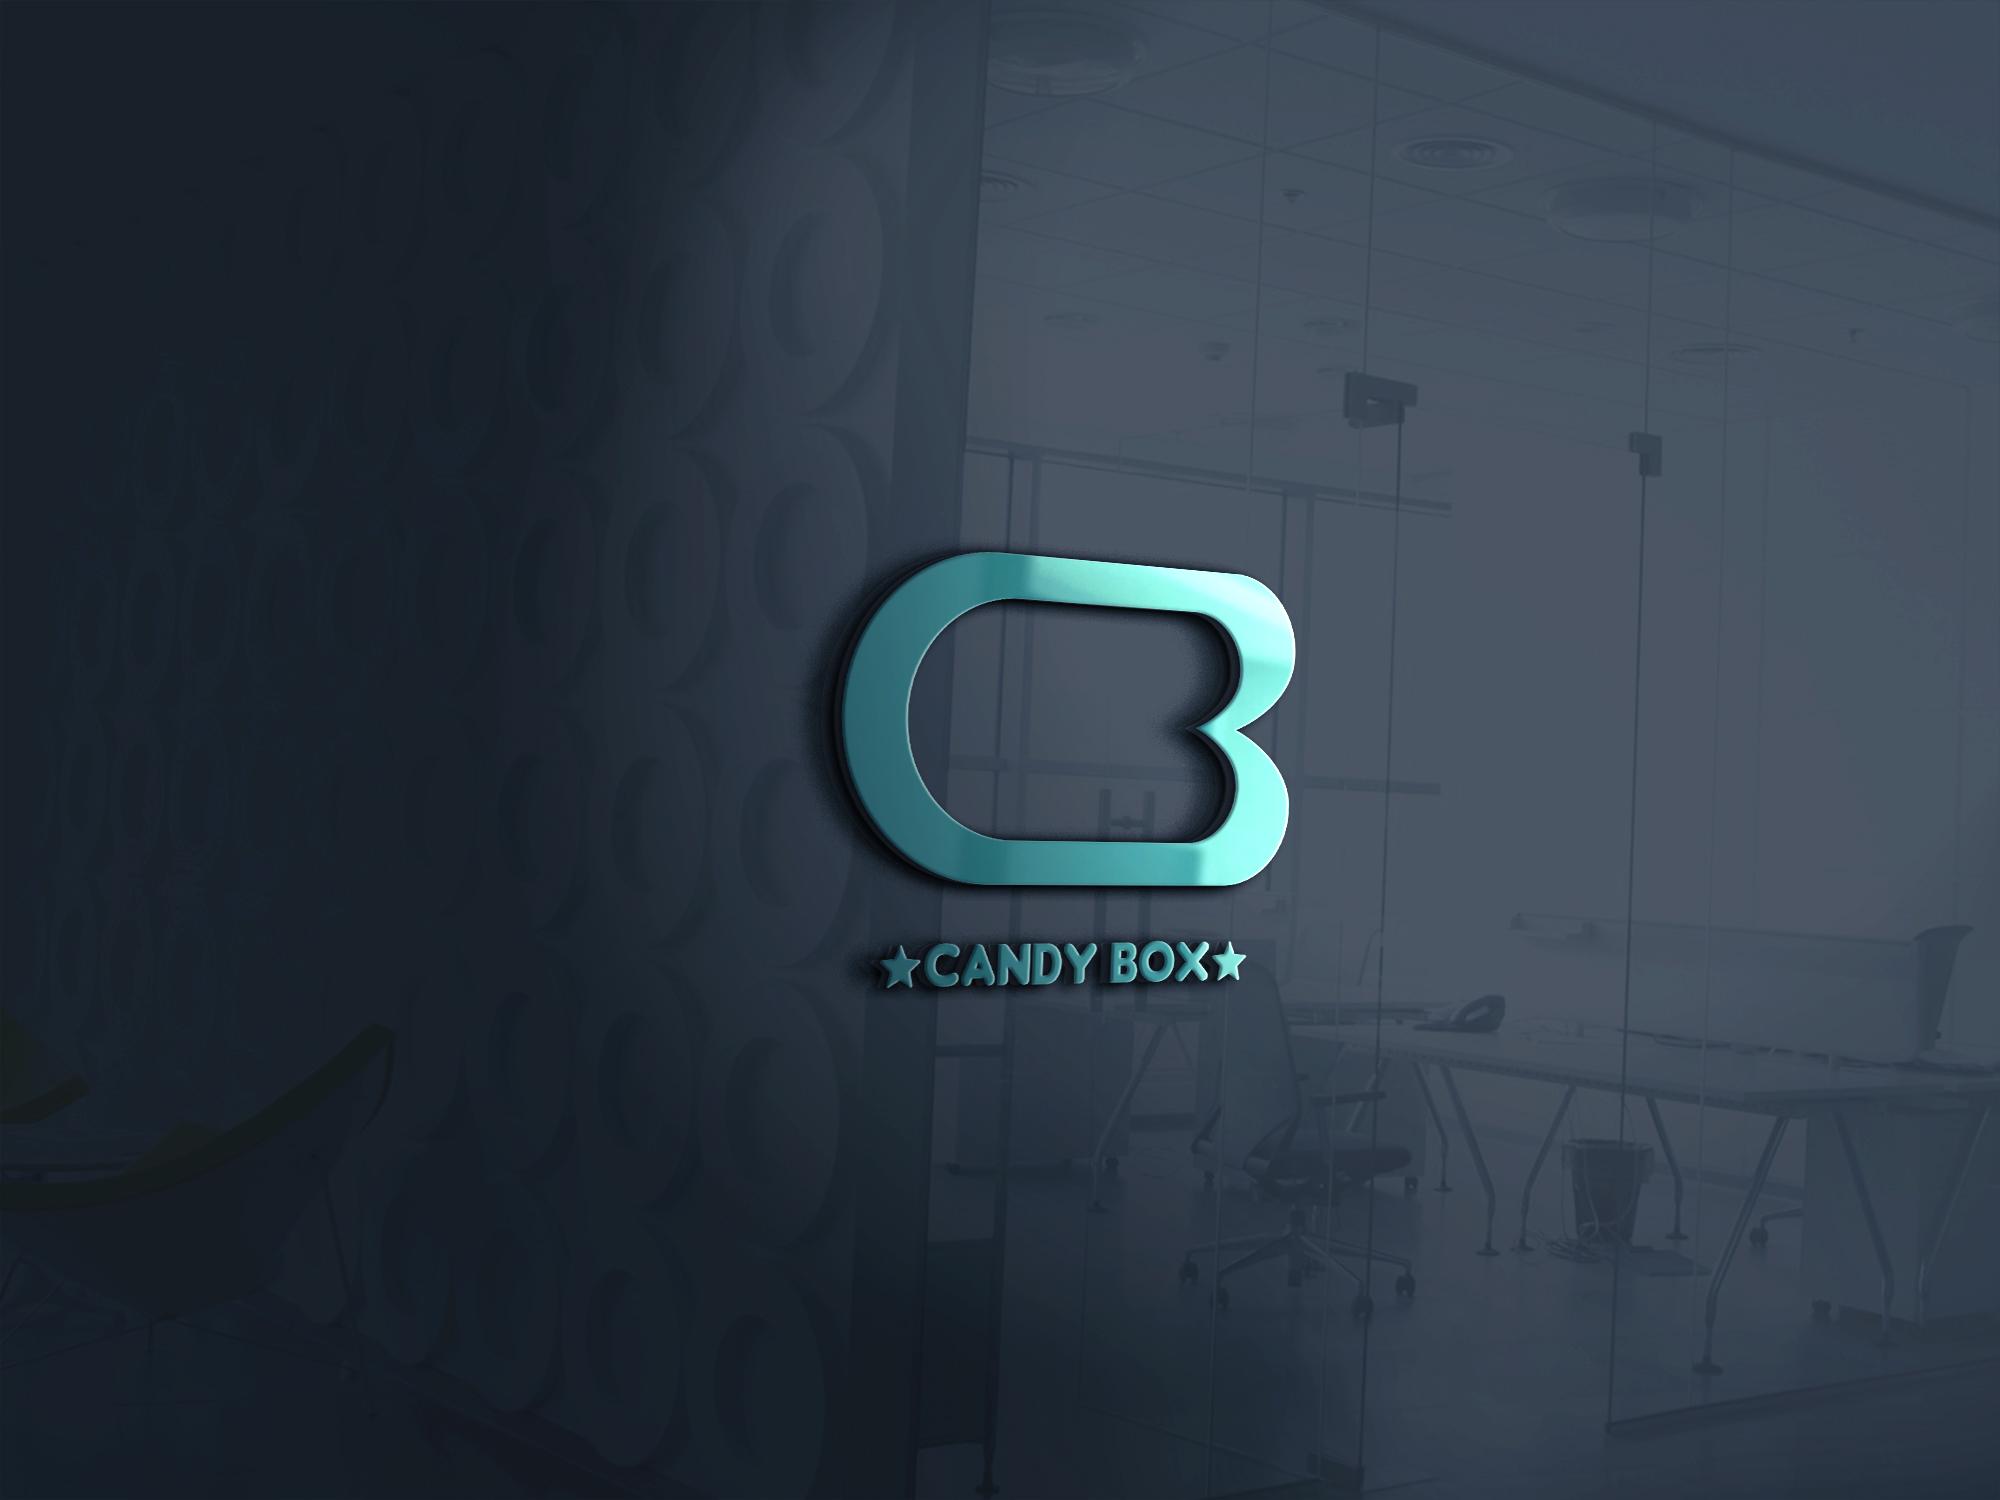 Разработка логотипа магазина сладостей со всего мира. фото f_9085a26ddd7e7498.jpg